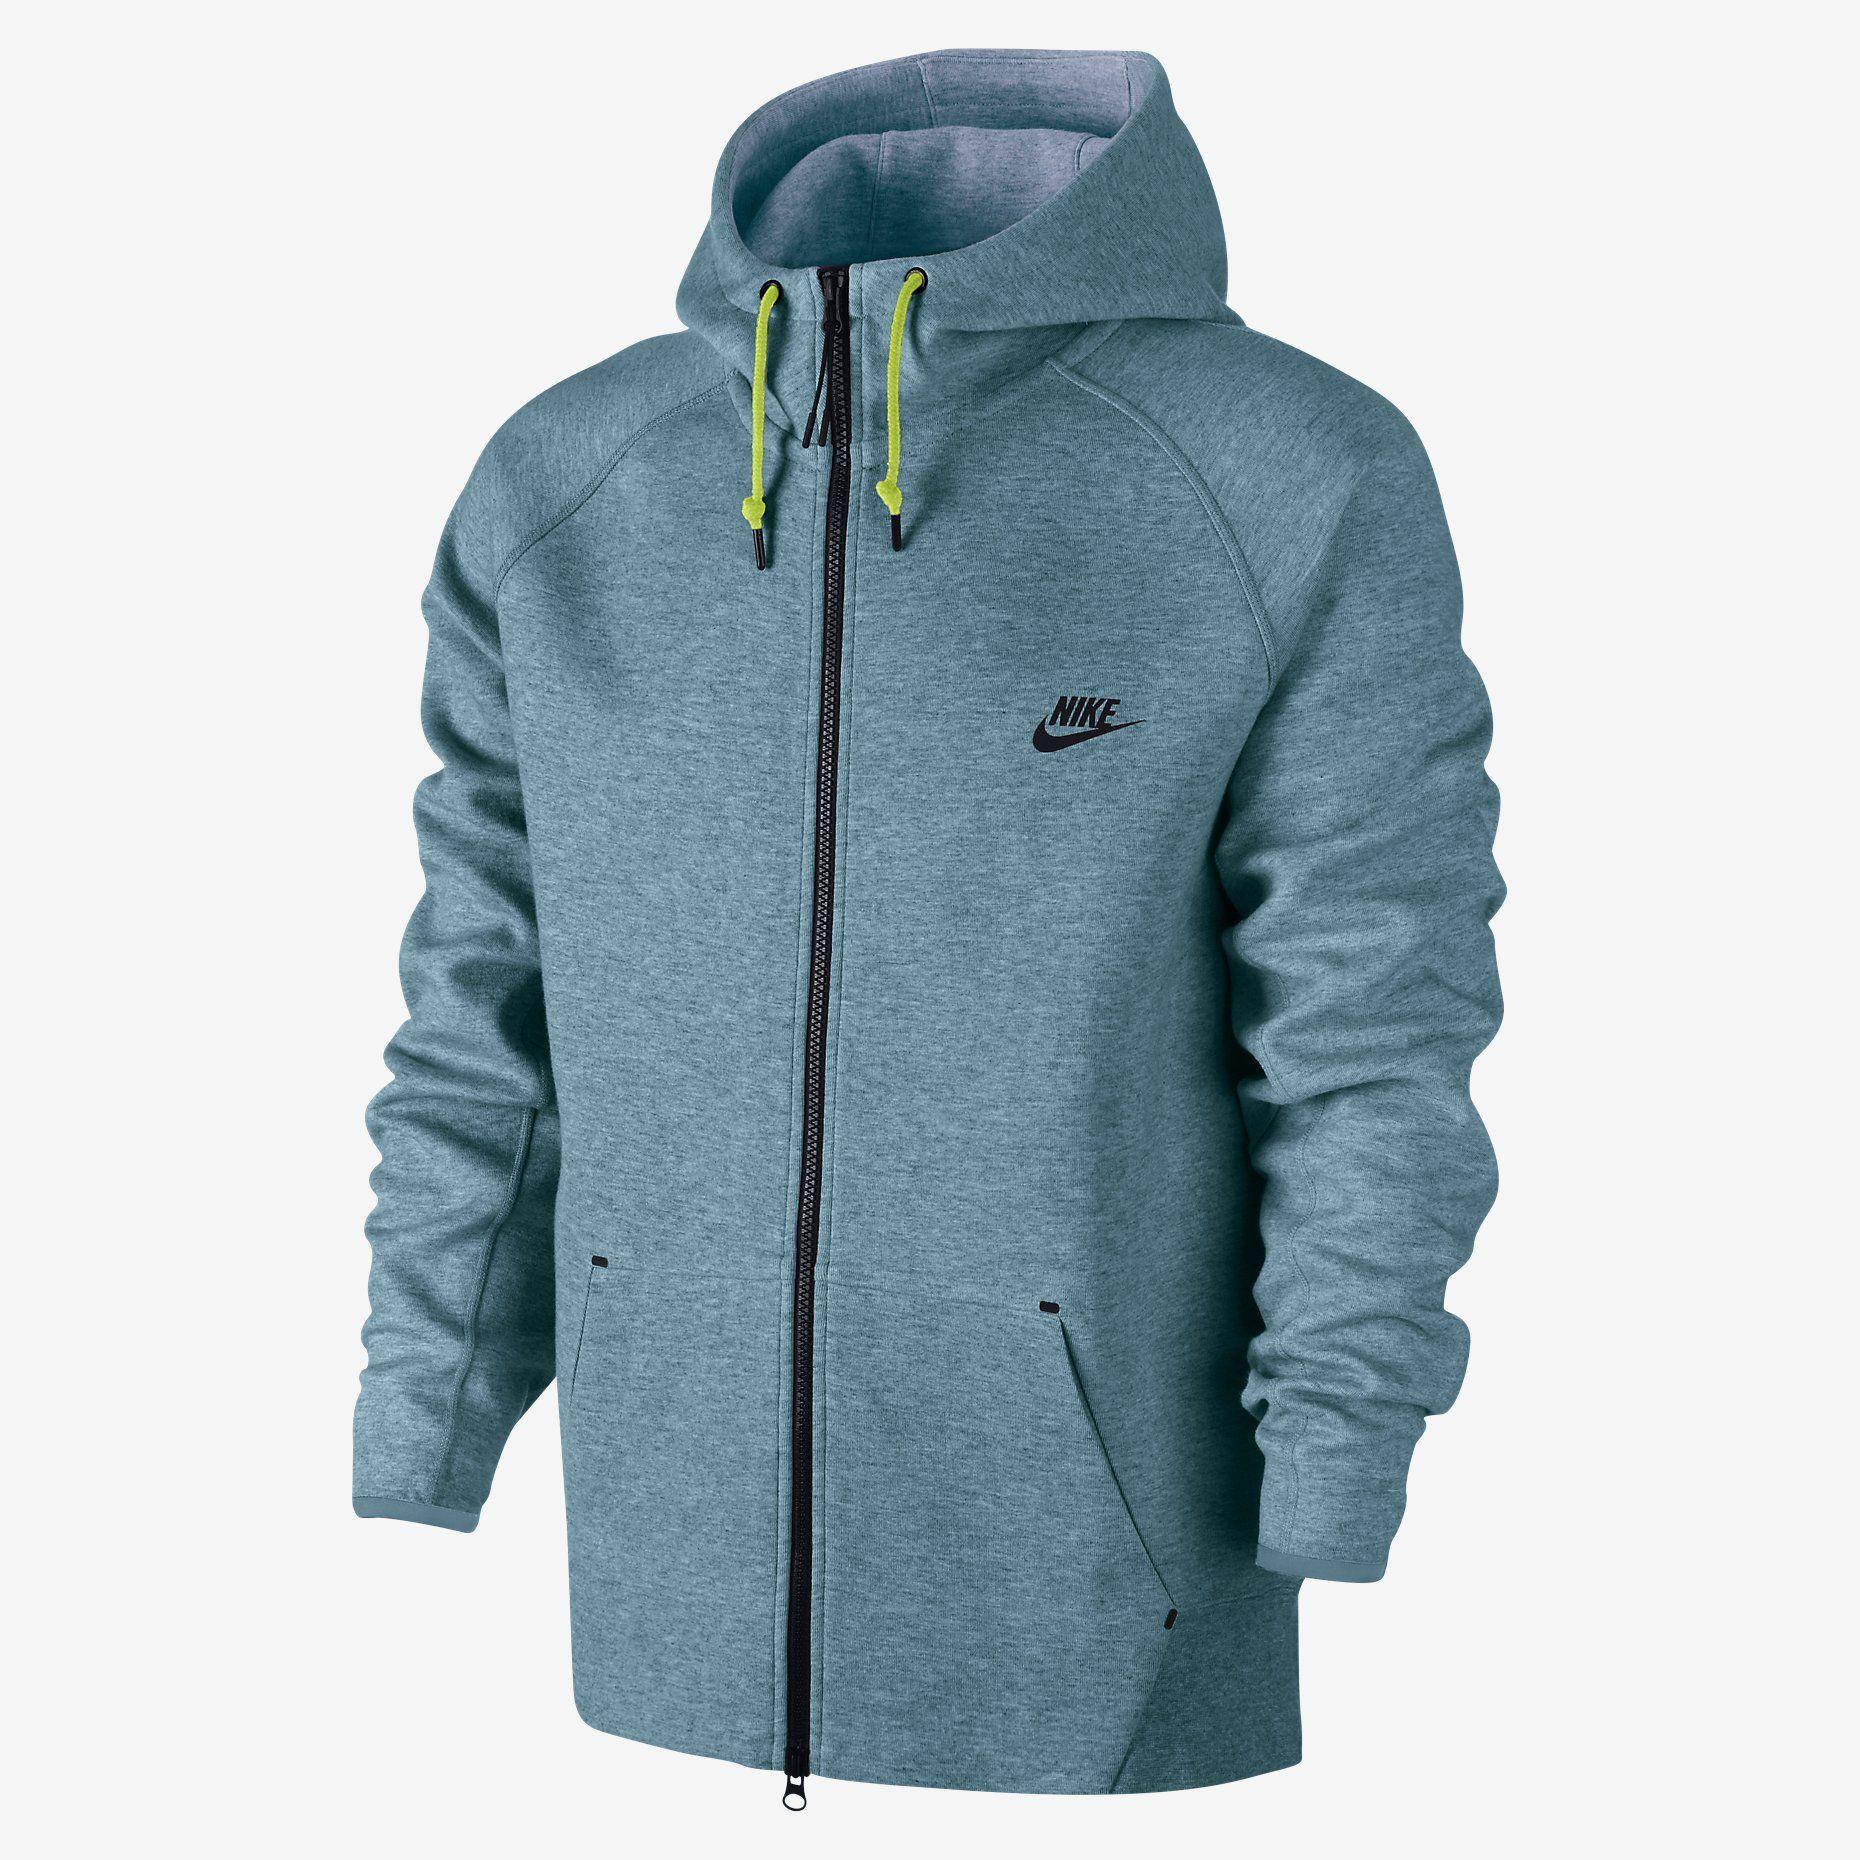 The Nike Tech Fleece AW77 1.0 FullZip Men's Hoodie